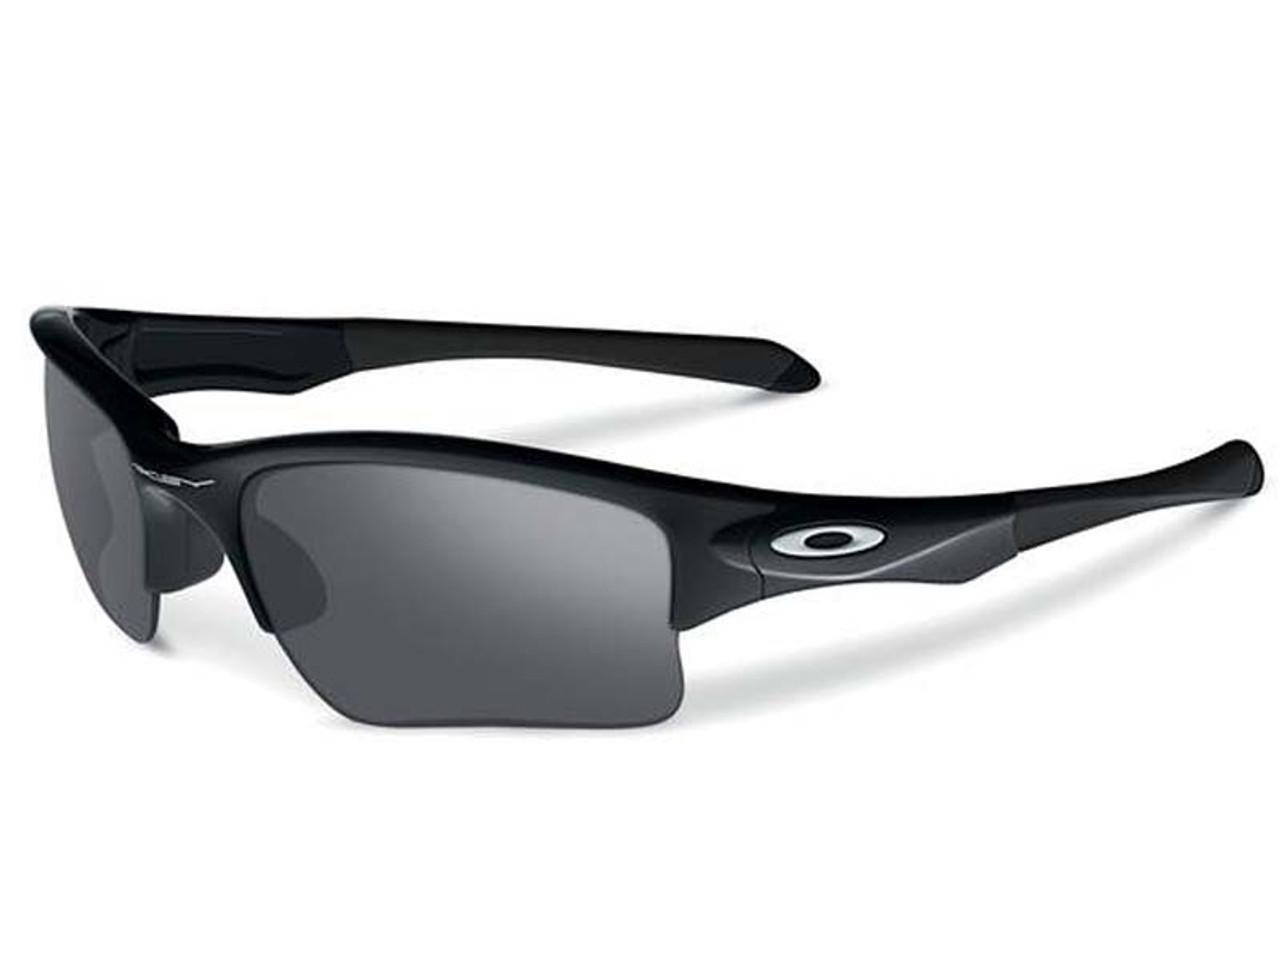 a552a3584a6 Oakley Quarter Jacket Juniors Sunglasses - Black w  Black For Sale ...